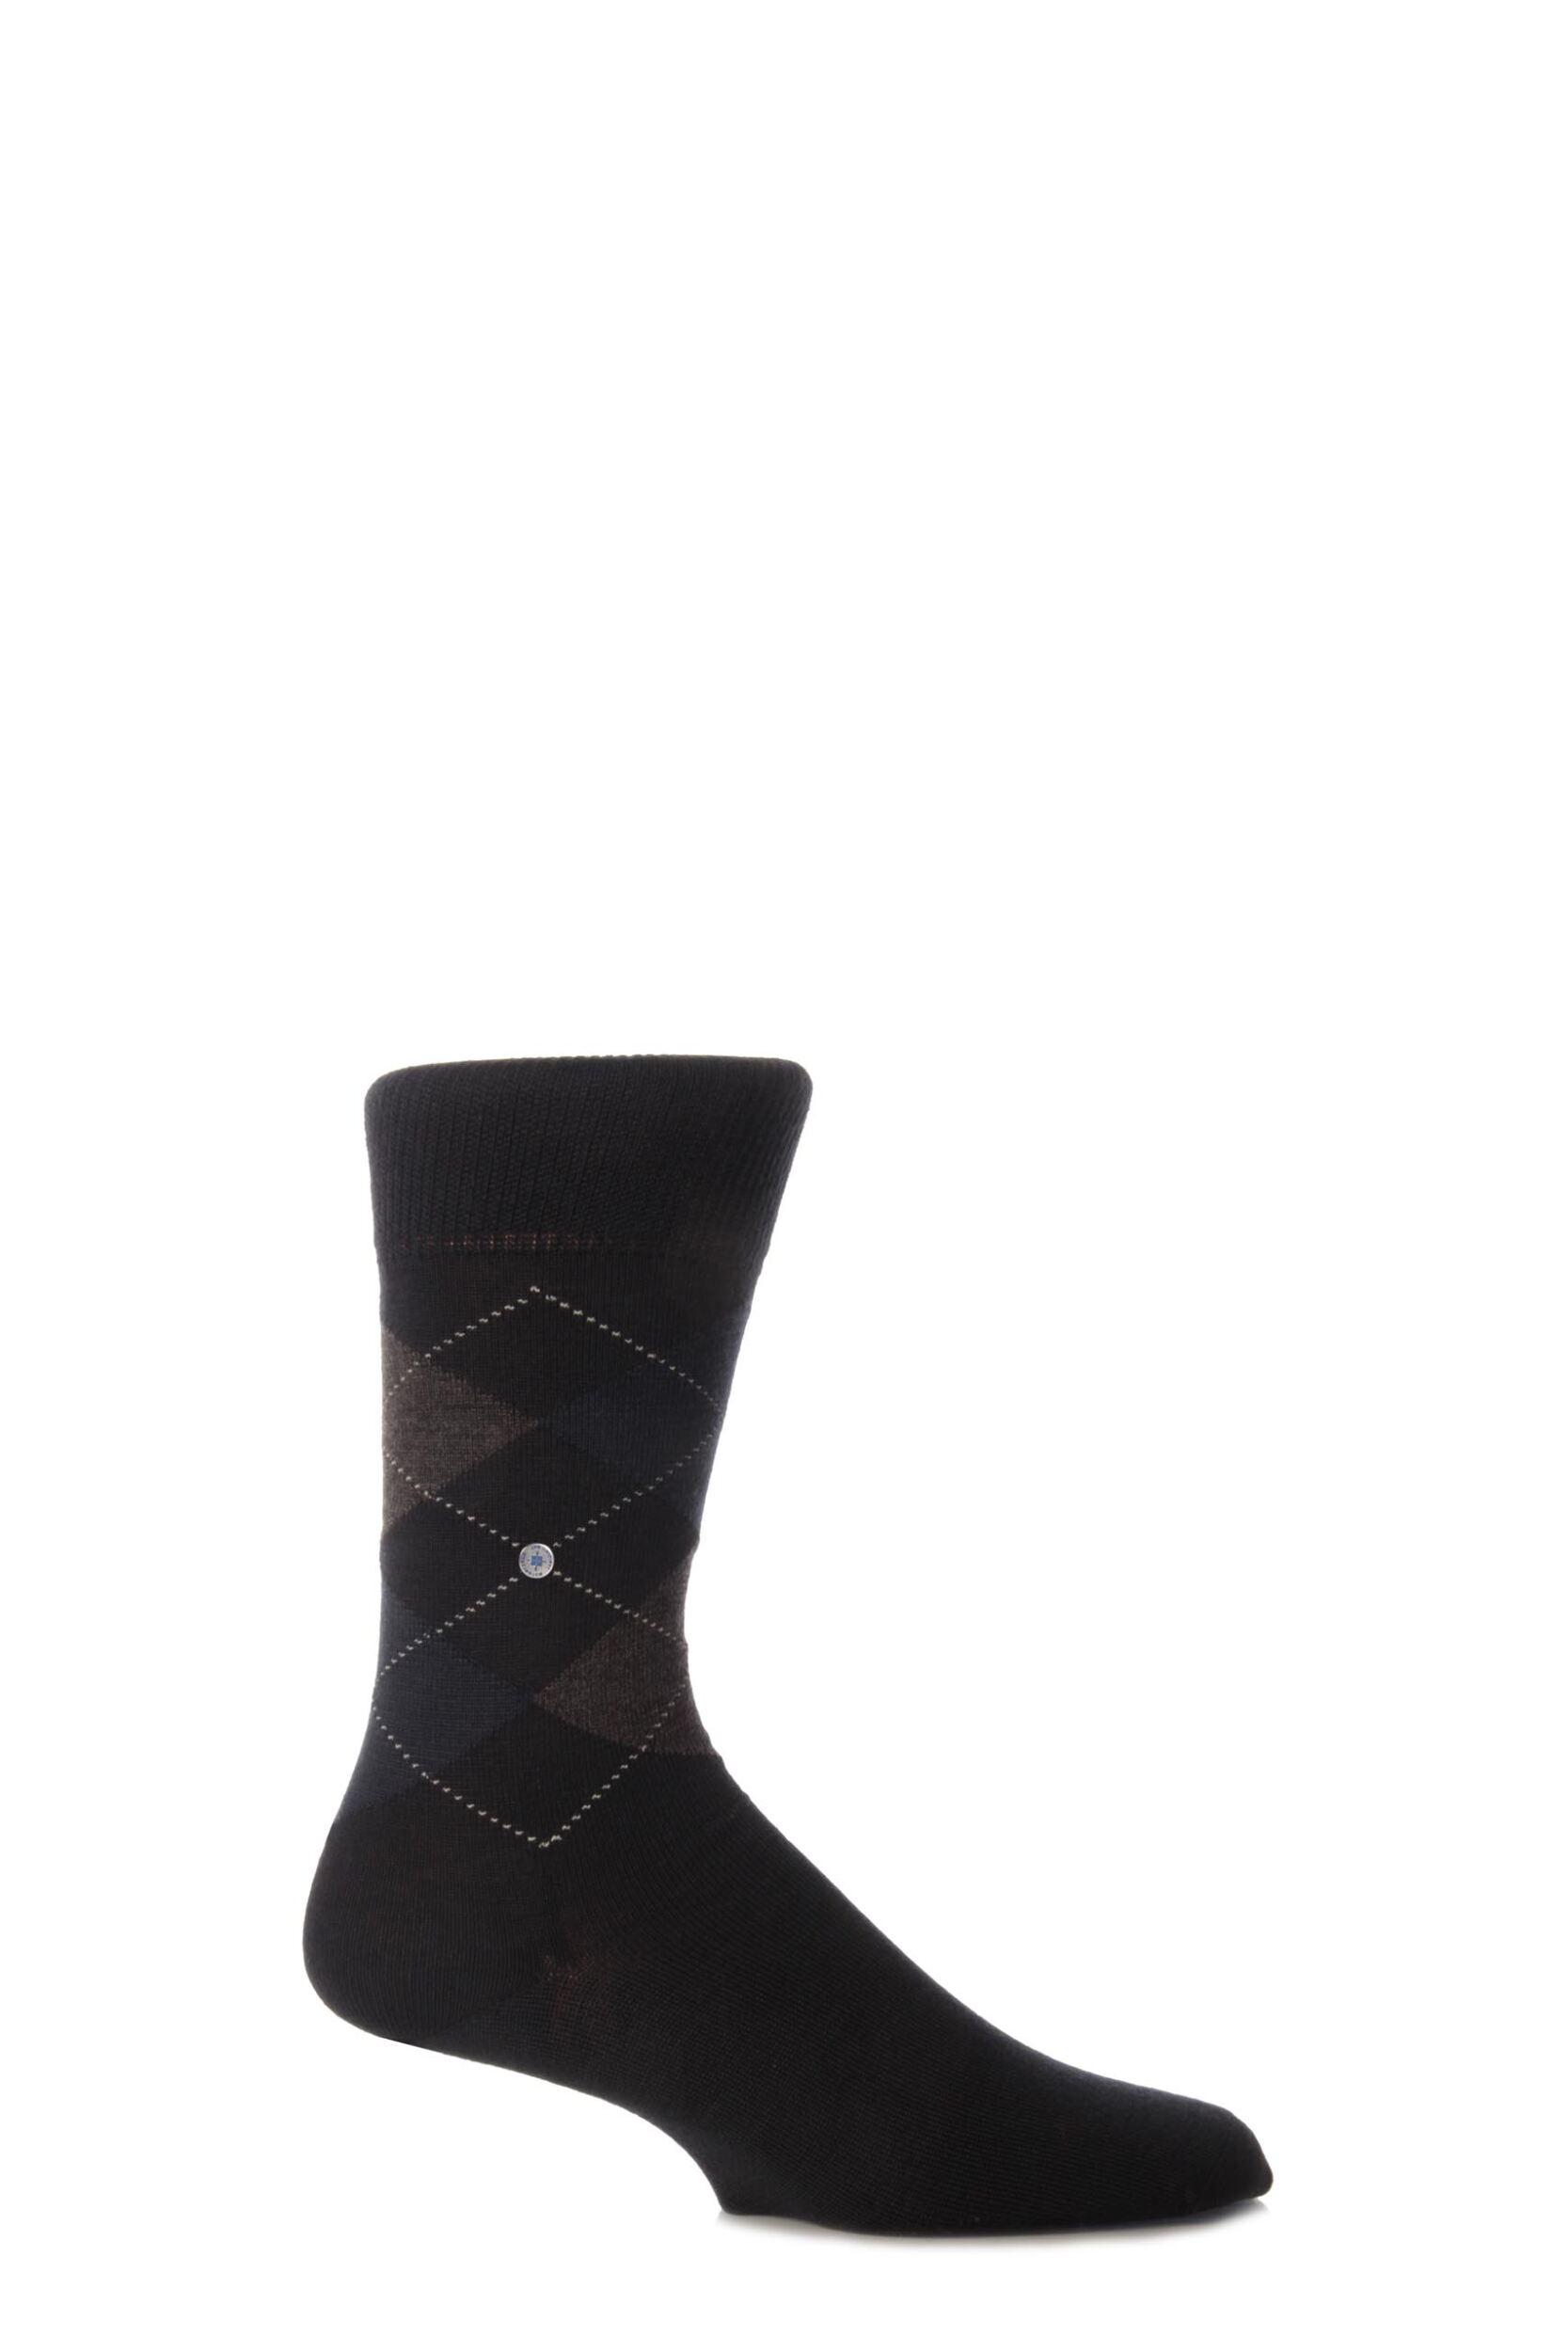 Edingburgh Wool Shop Shoes